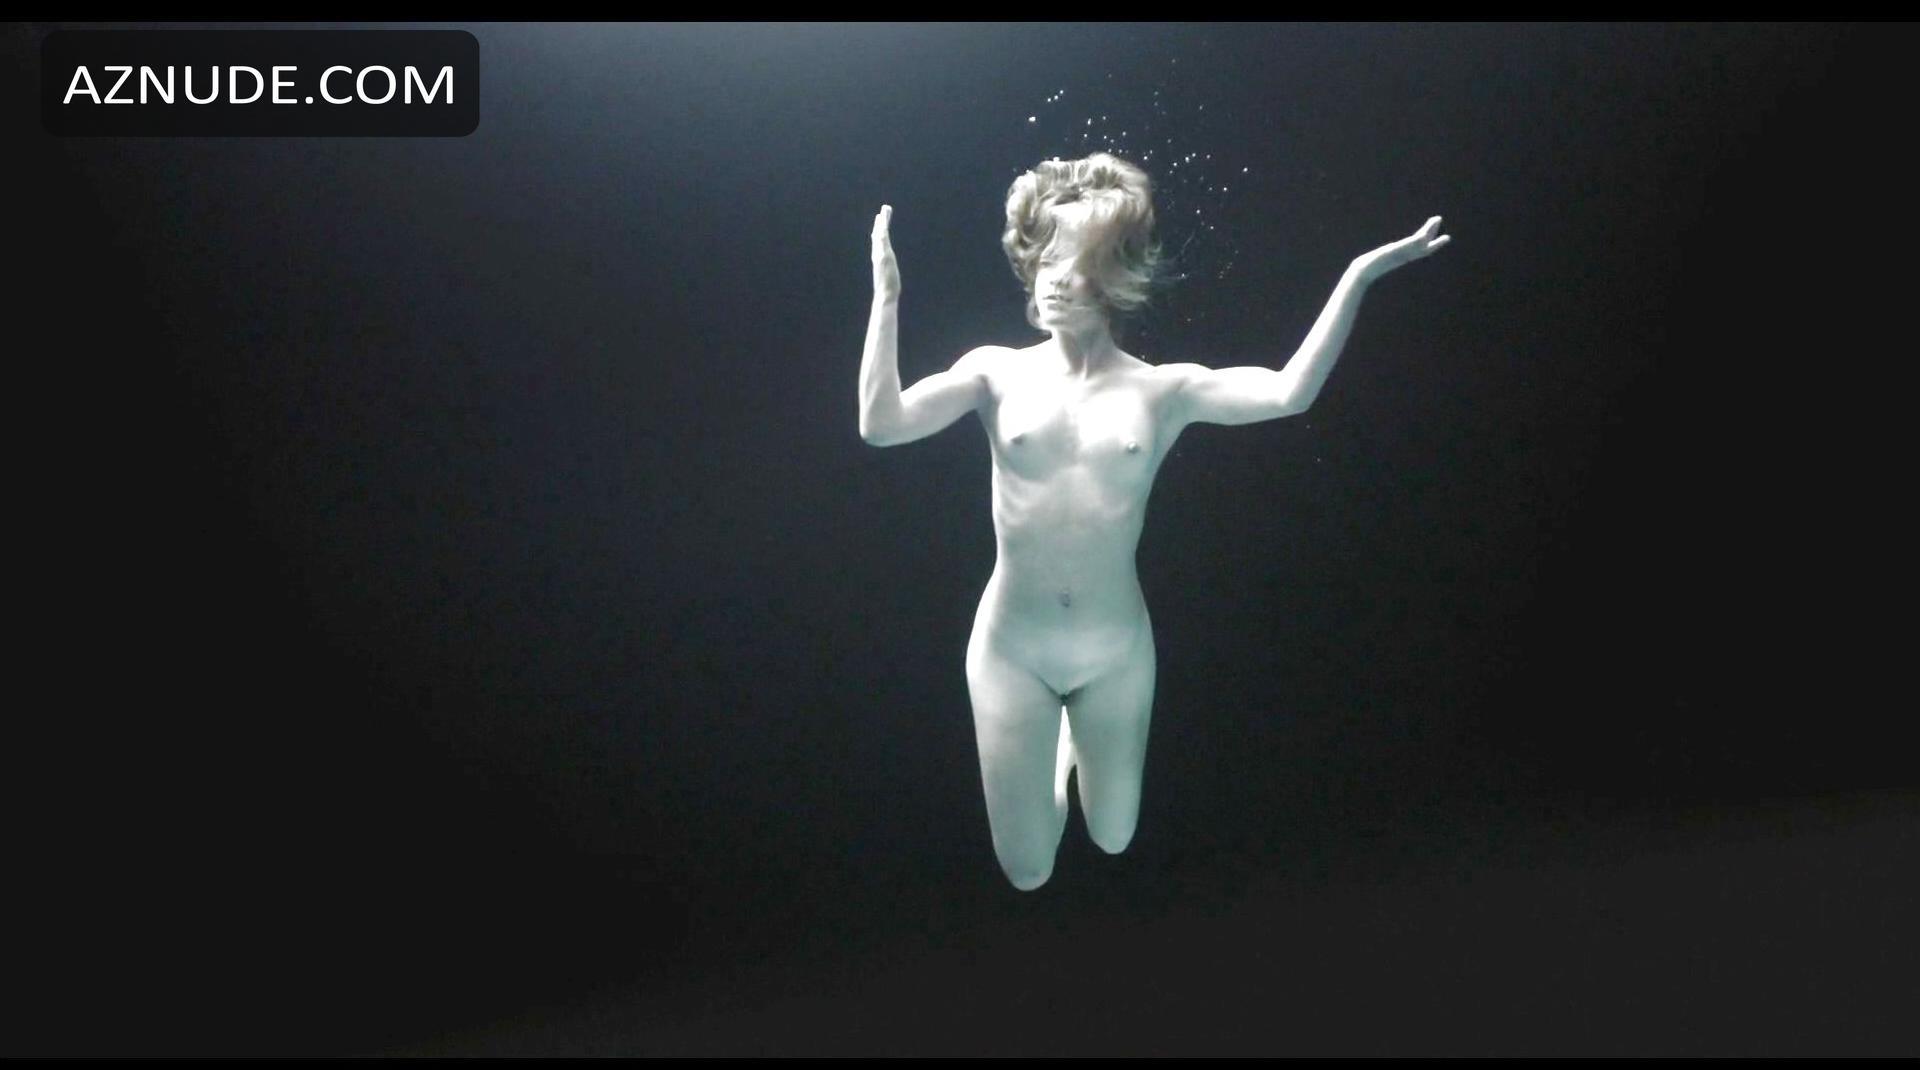 Kokone Sasaki Sukimasuki - JP 2015 [720p HDTV [topless],Allie silva topless Adult image Lisa zimmermann playboy,Elise neal tits